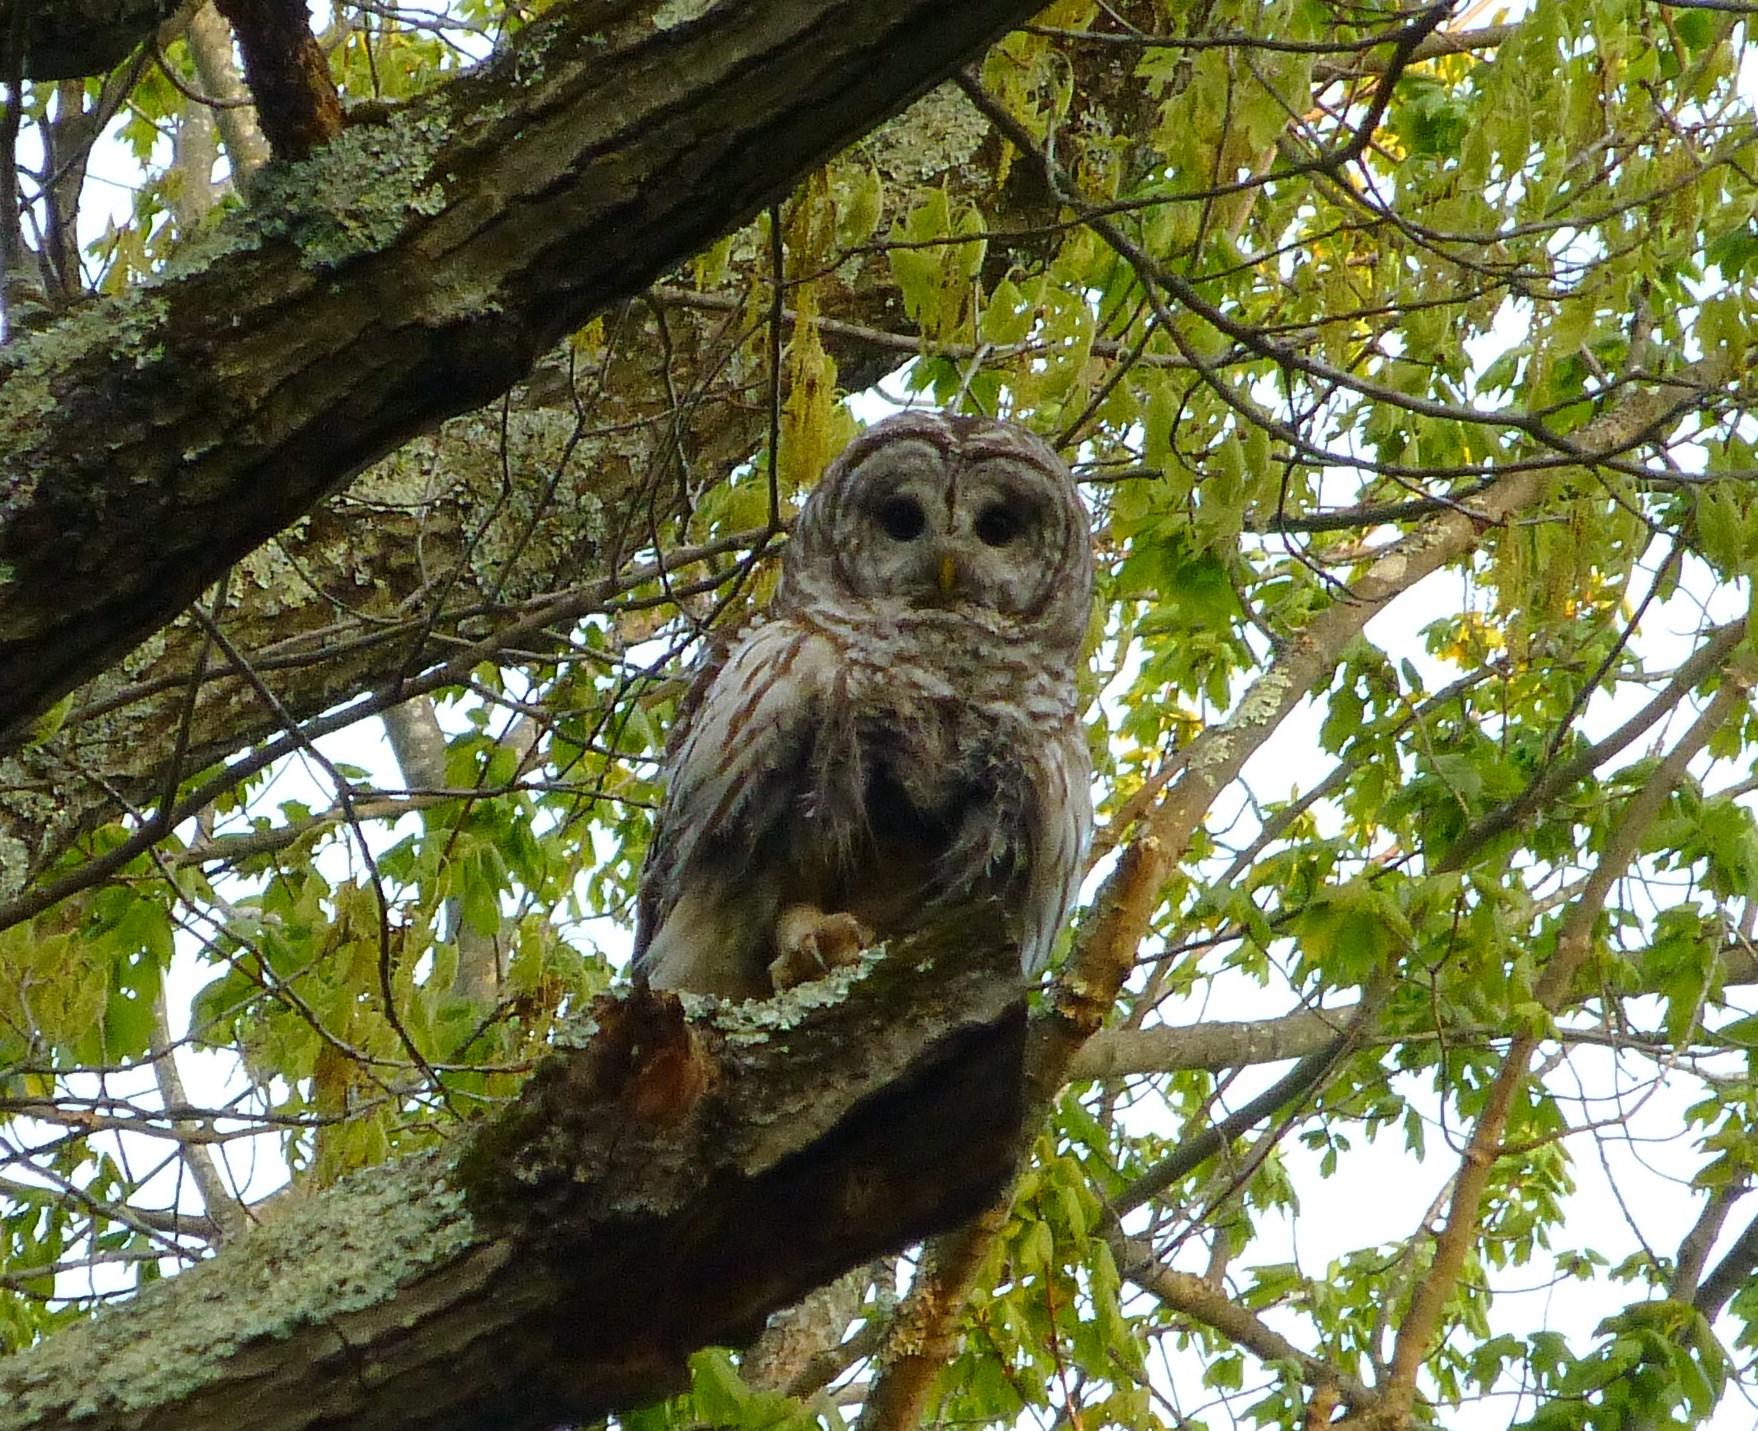 barred-owl-across-from-nest-at-dusk-5-16-16